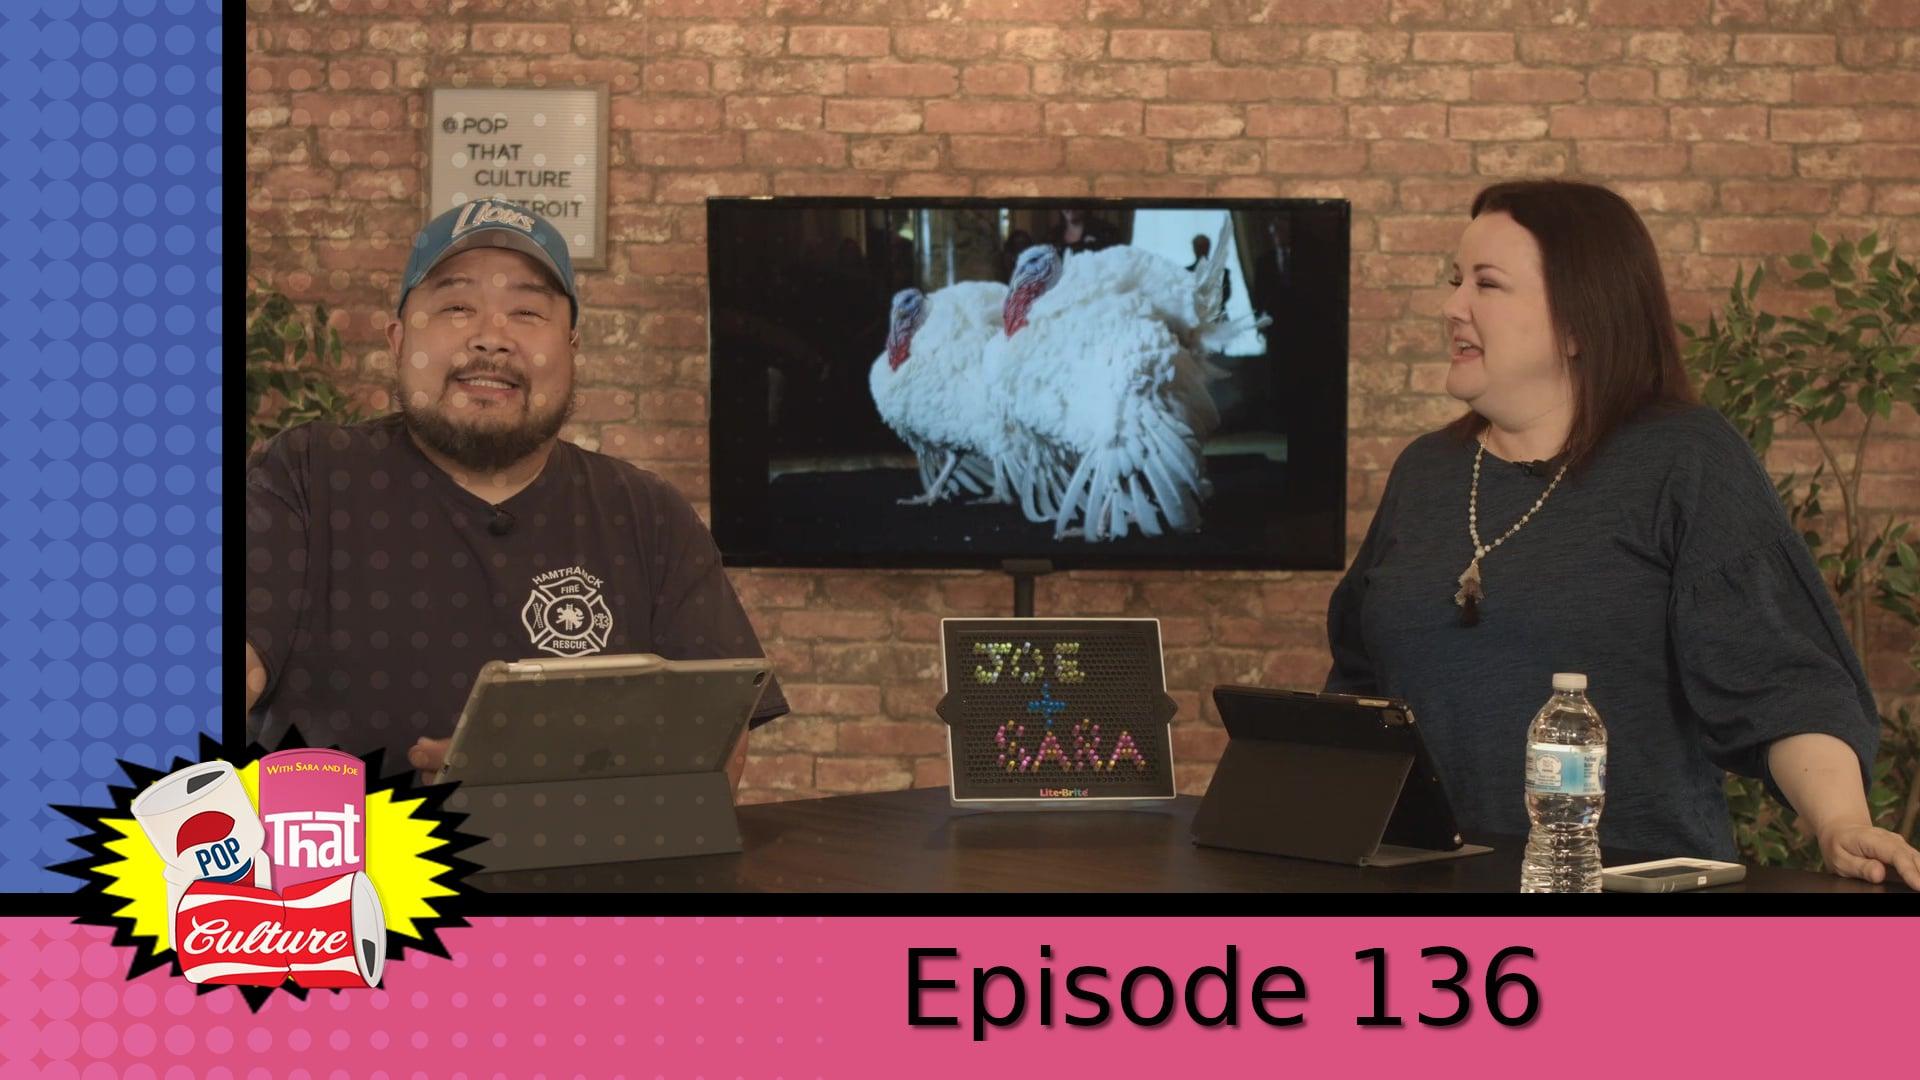 Pop That Culture - Episode 136